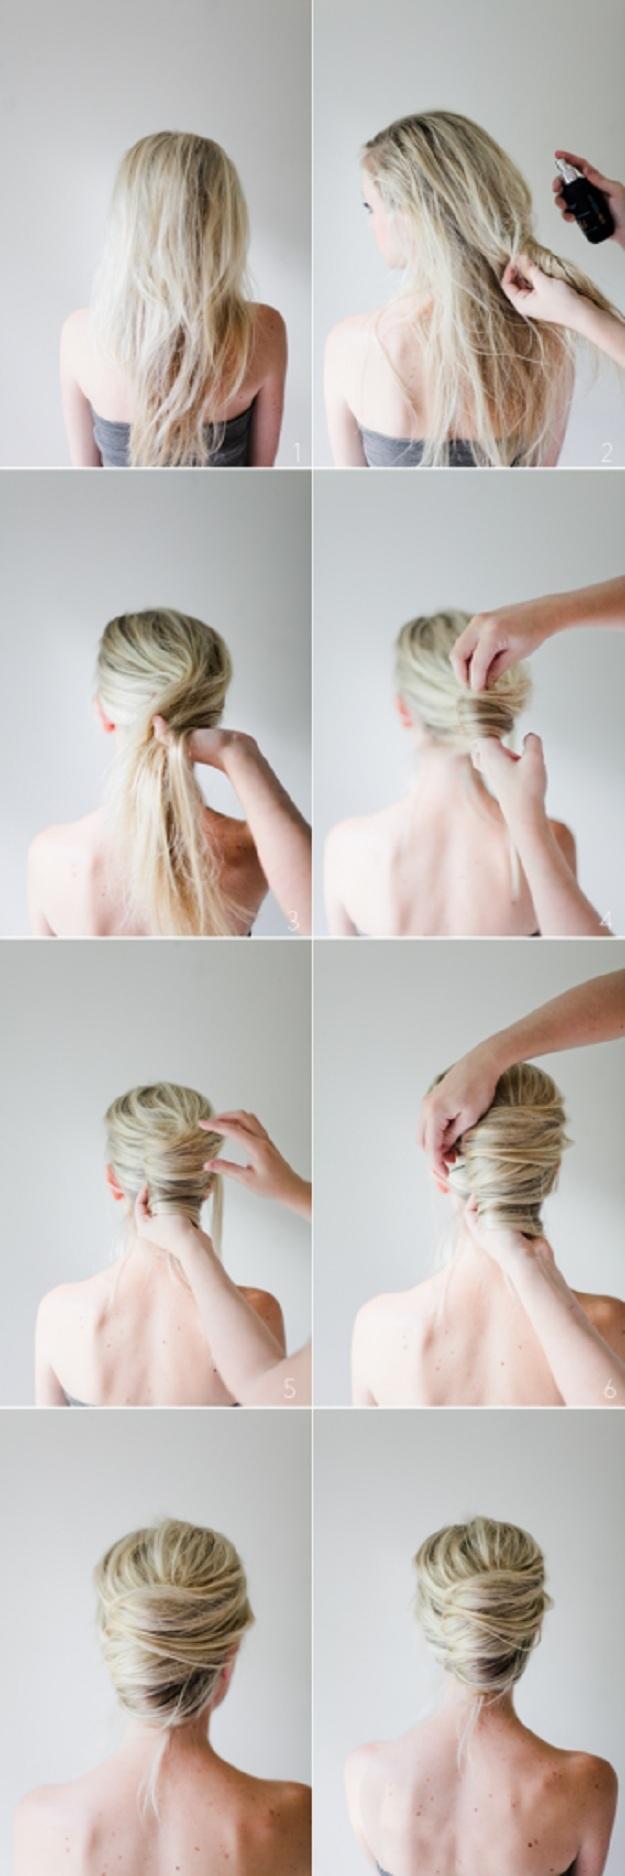 coiffures-express-8